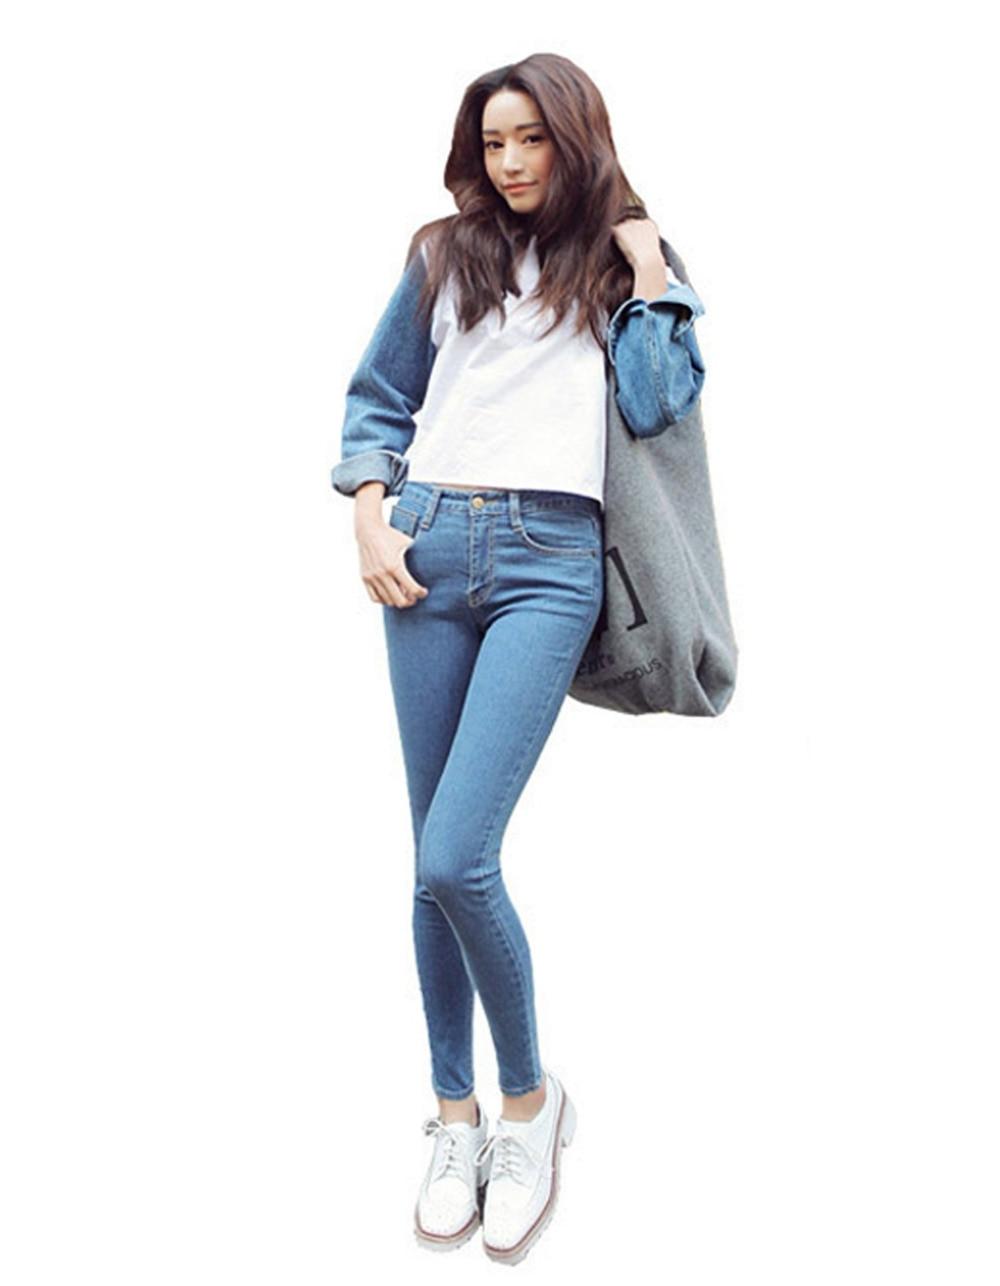 ФОТО Fashion Slim Jeans For Women Skinny High Waist Jeans Woman Blue Denim Pencil Pants Stretch Waist Women Jeans